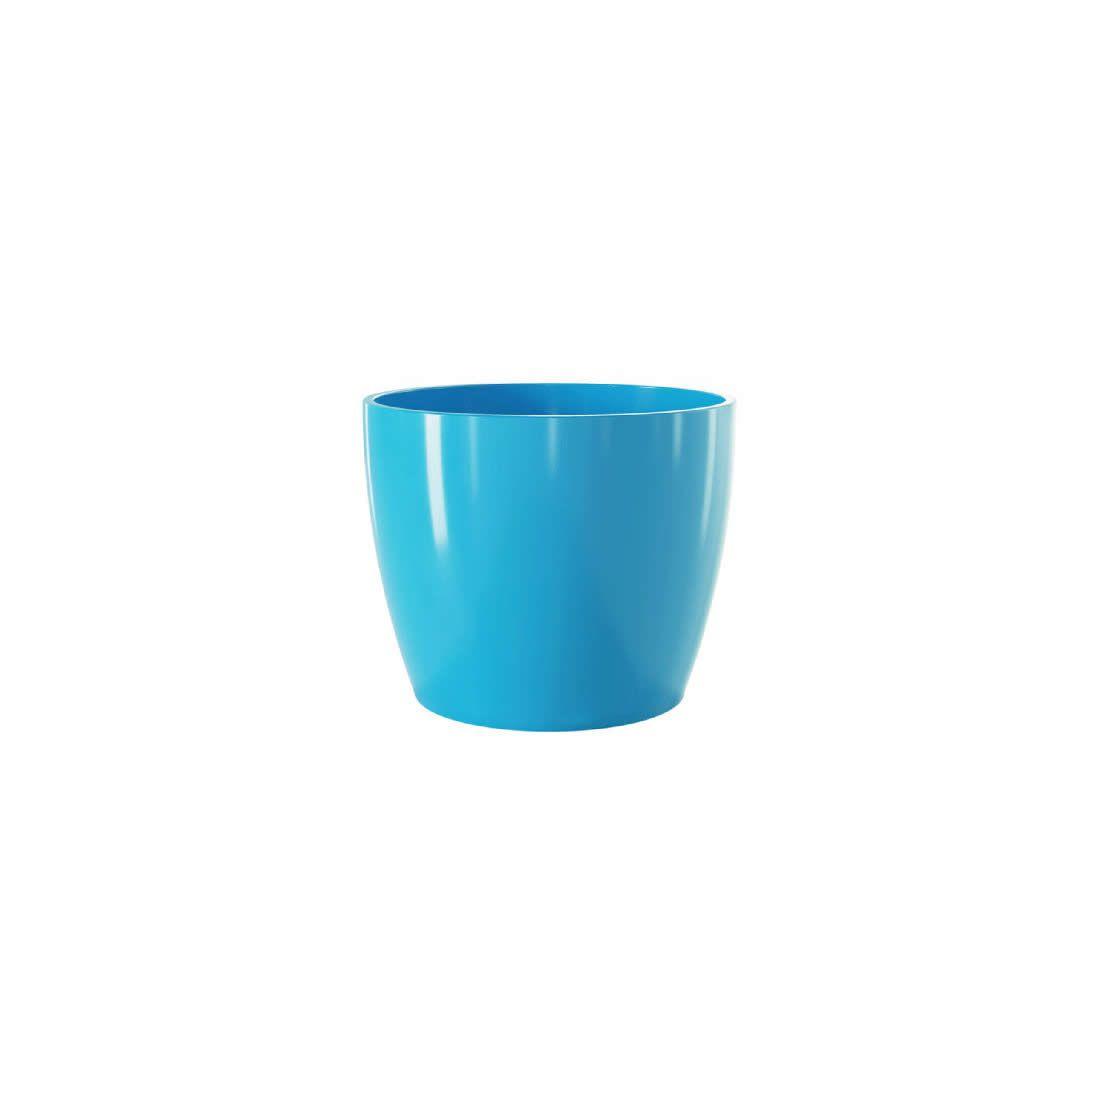 Vaso Para Planta Cerâmico Munique Azul 11 - Japi